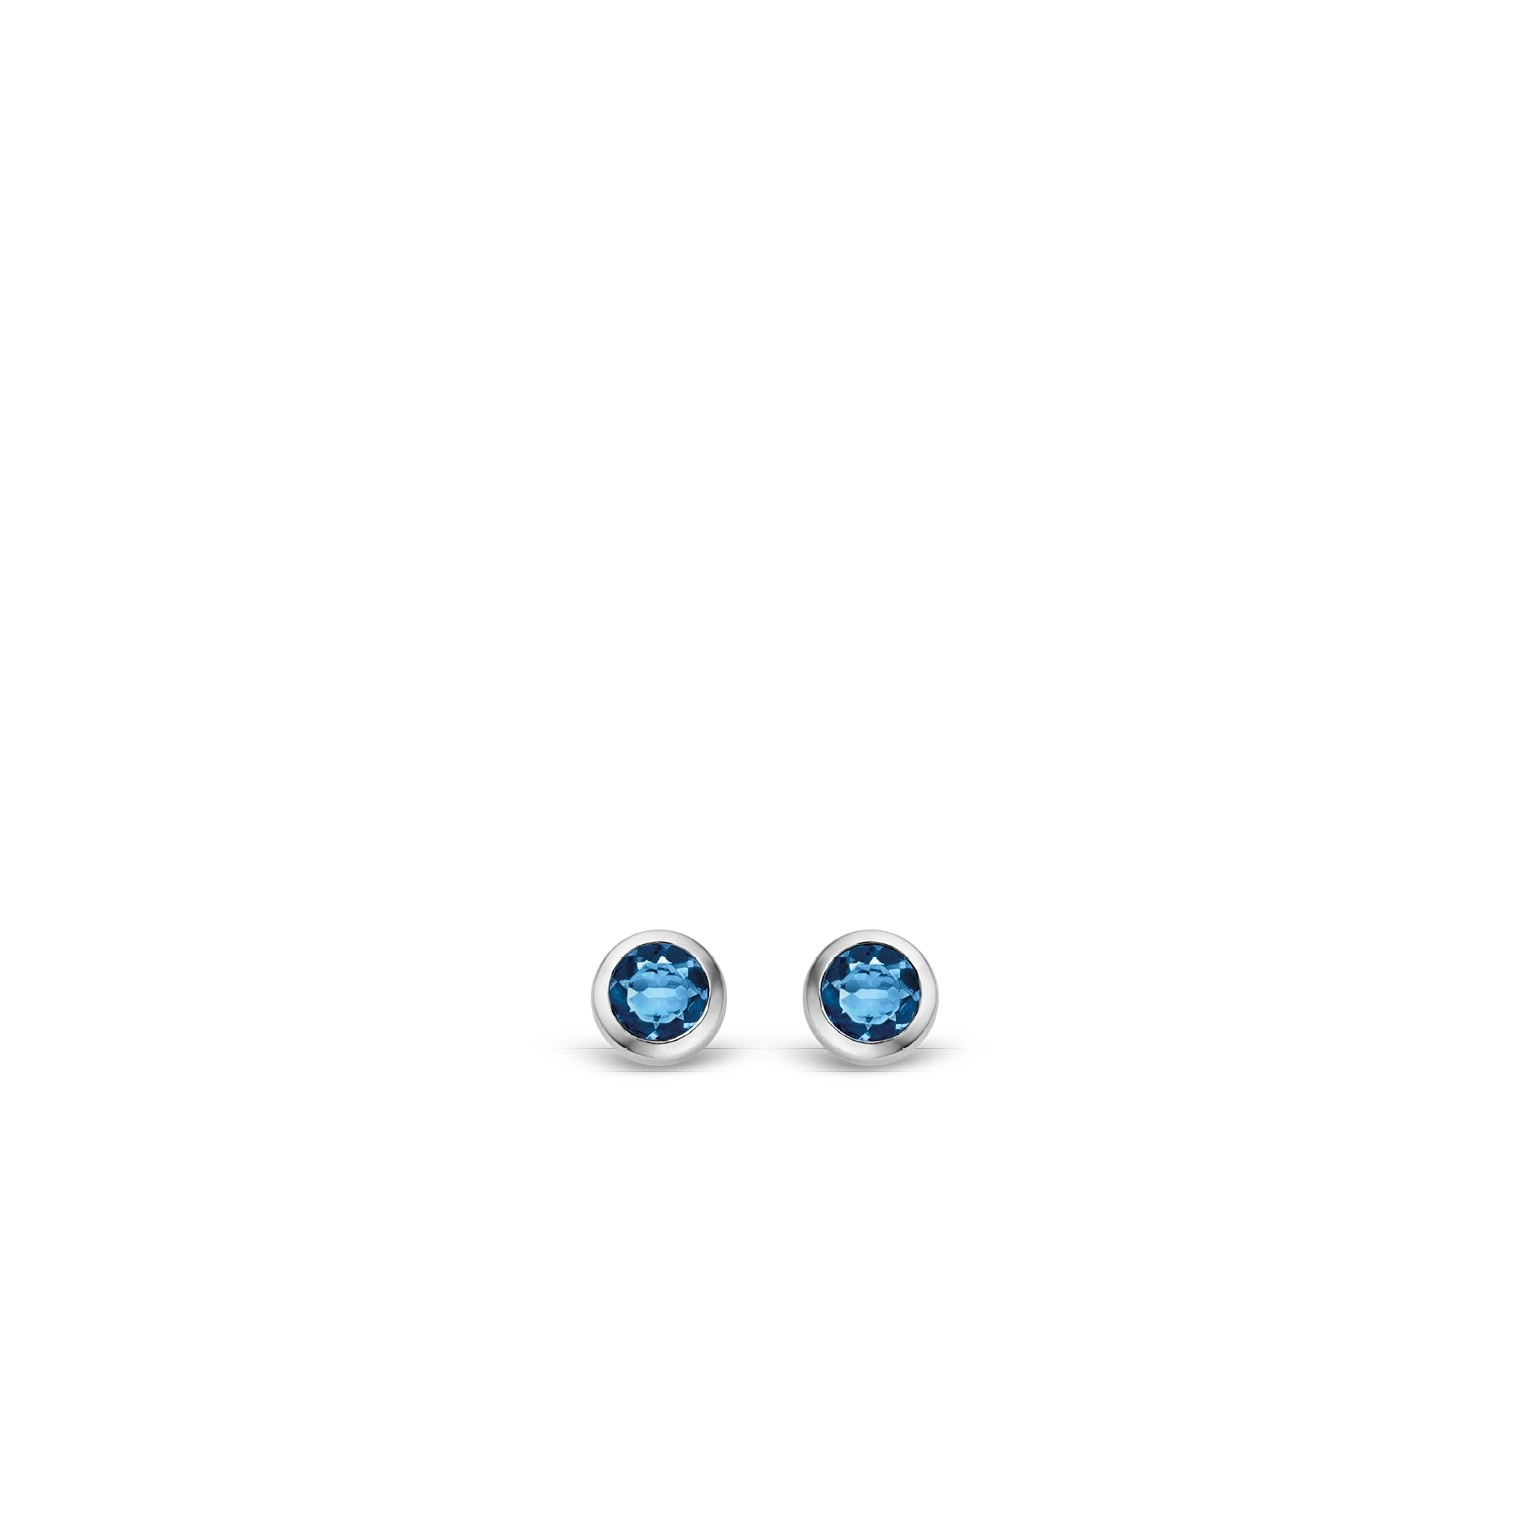 TI SENTO - Milano Earrings 7597DB-1